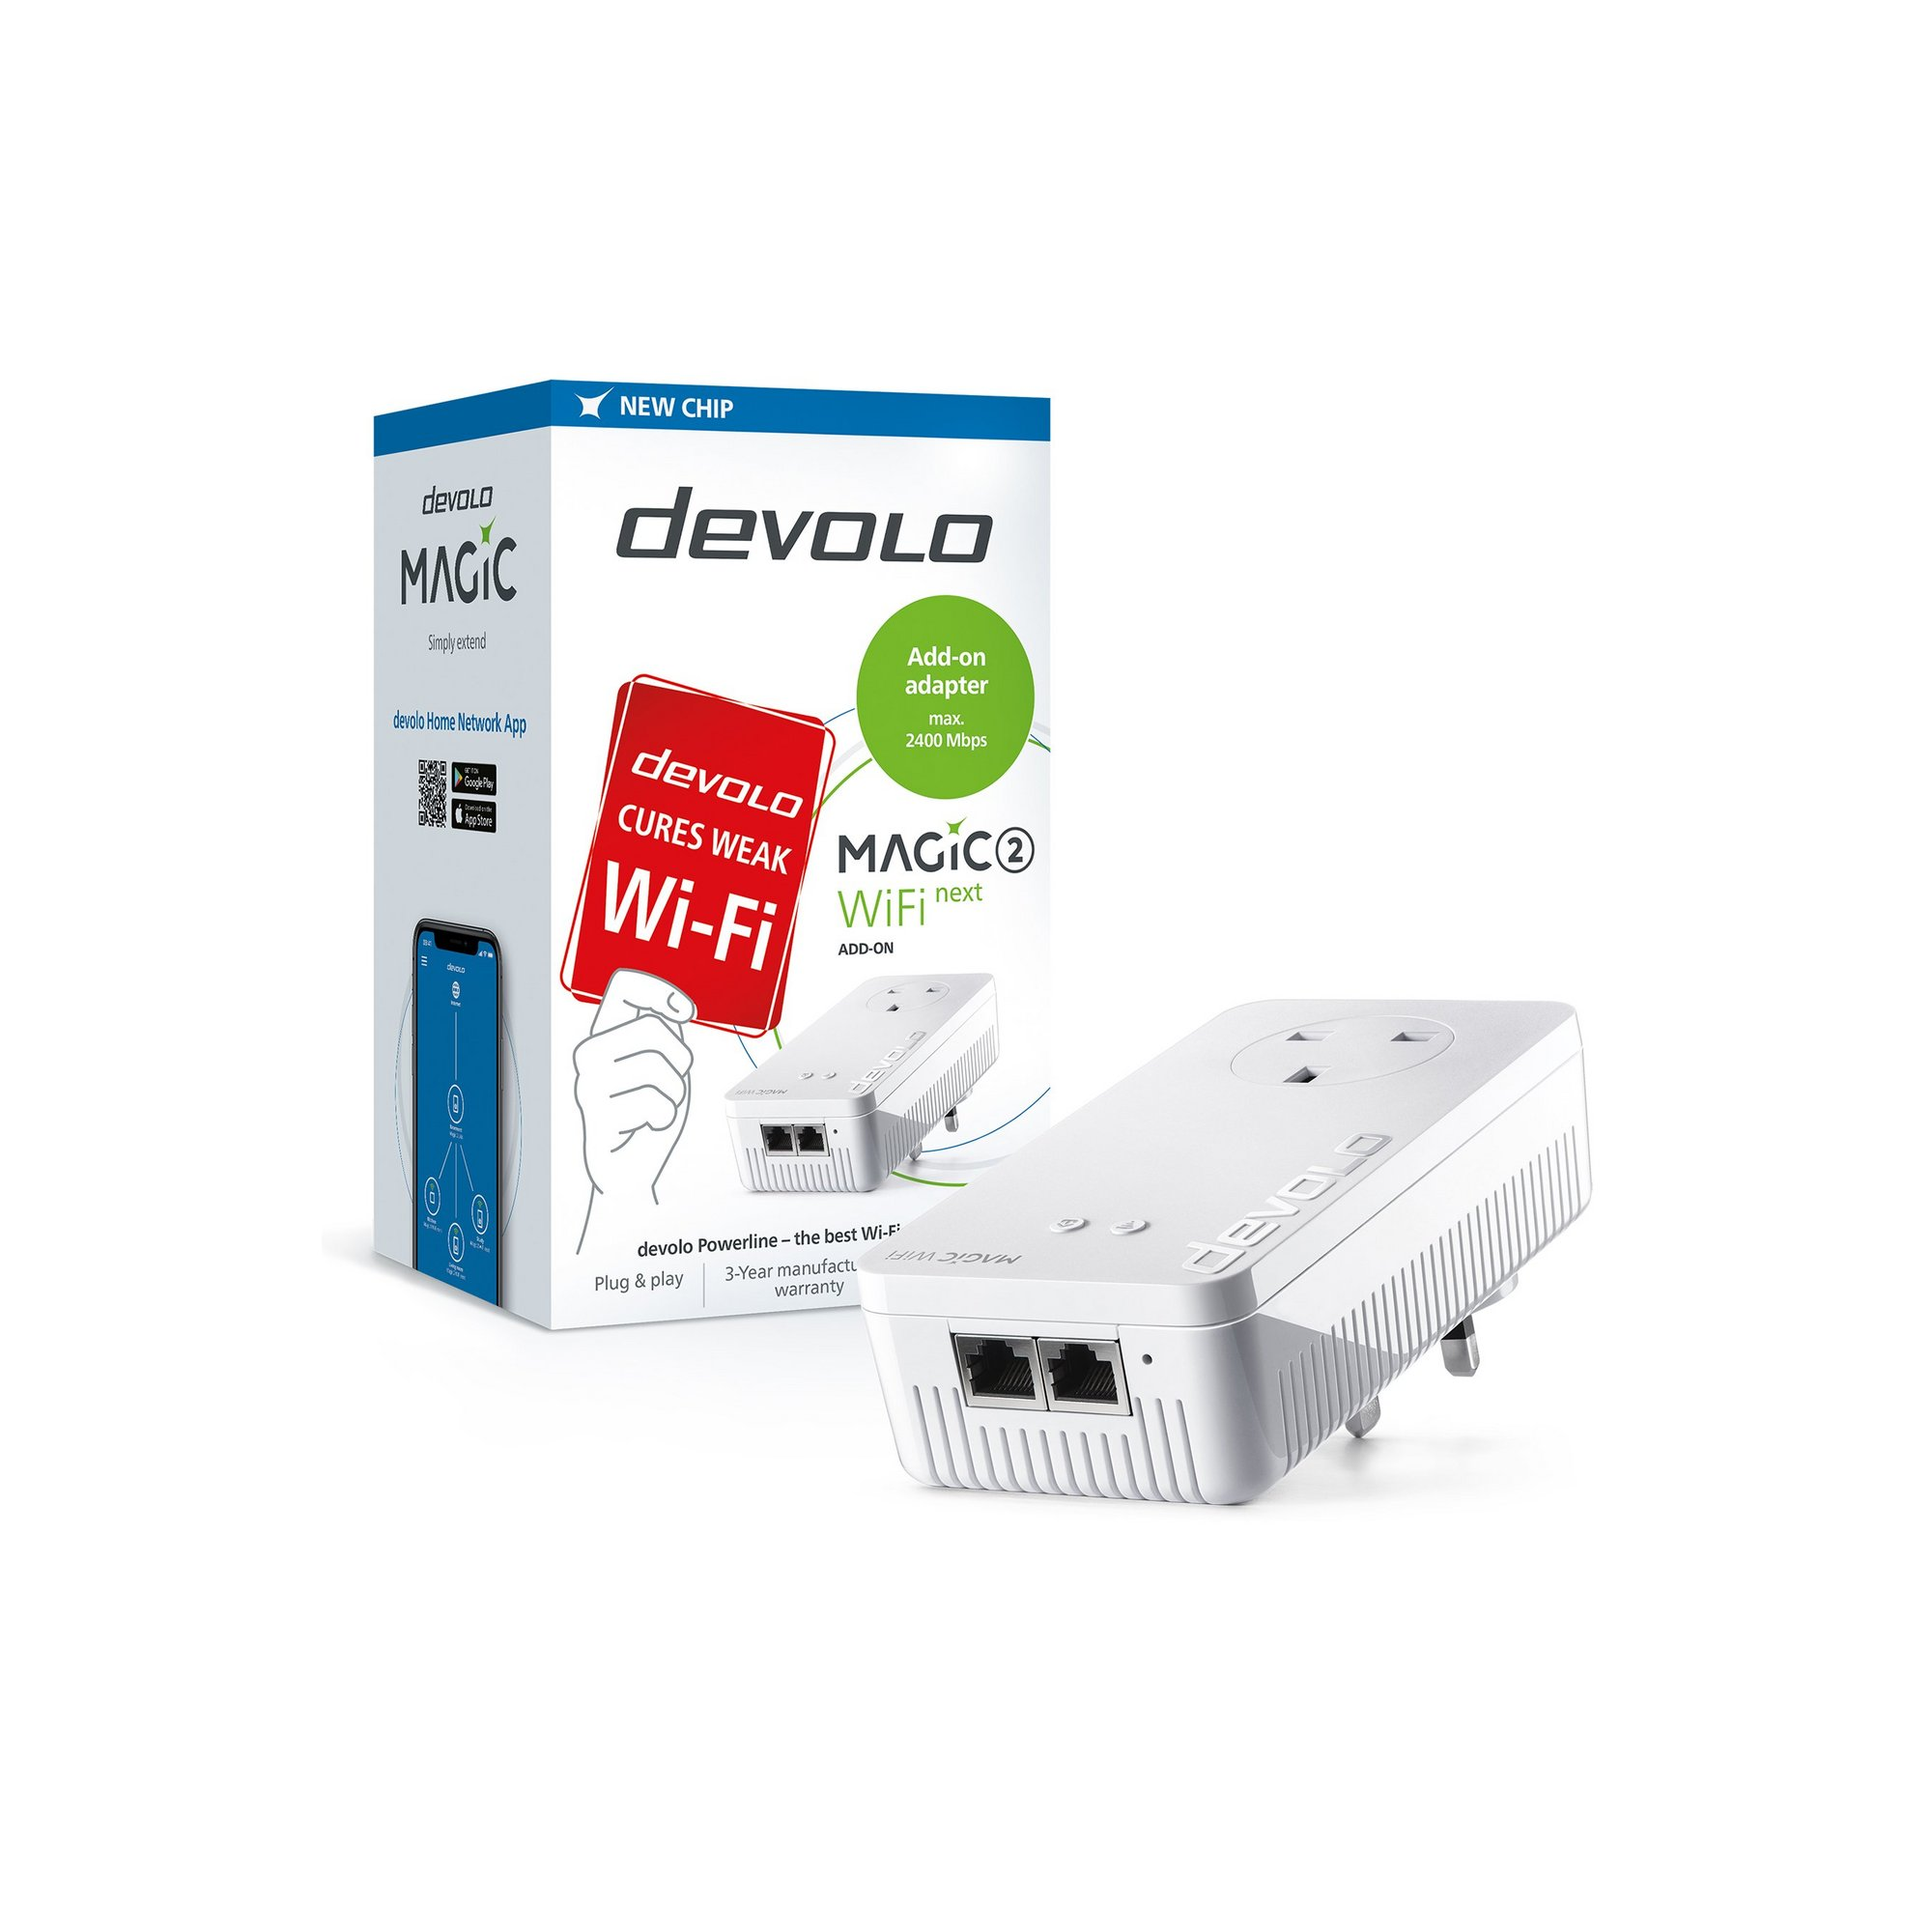 Image of Devolo Magic 2 2400 WiFi NEXT Add-On Adapter